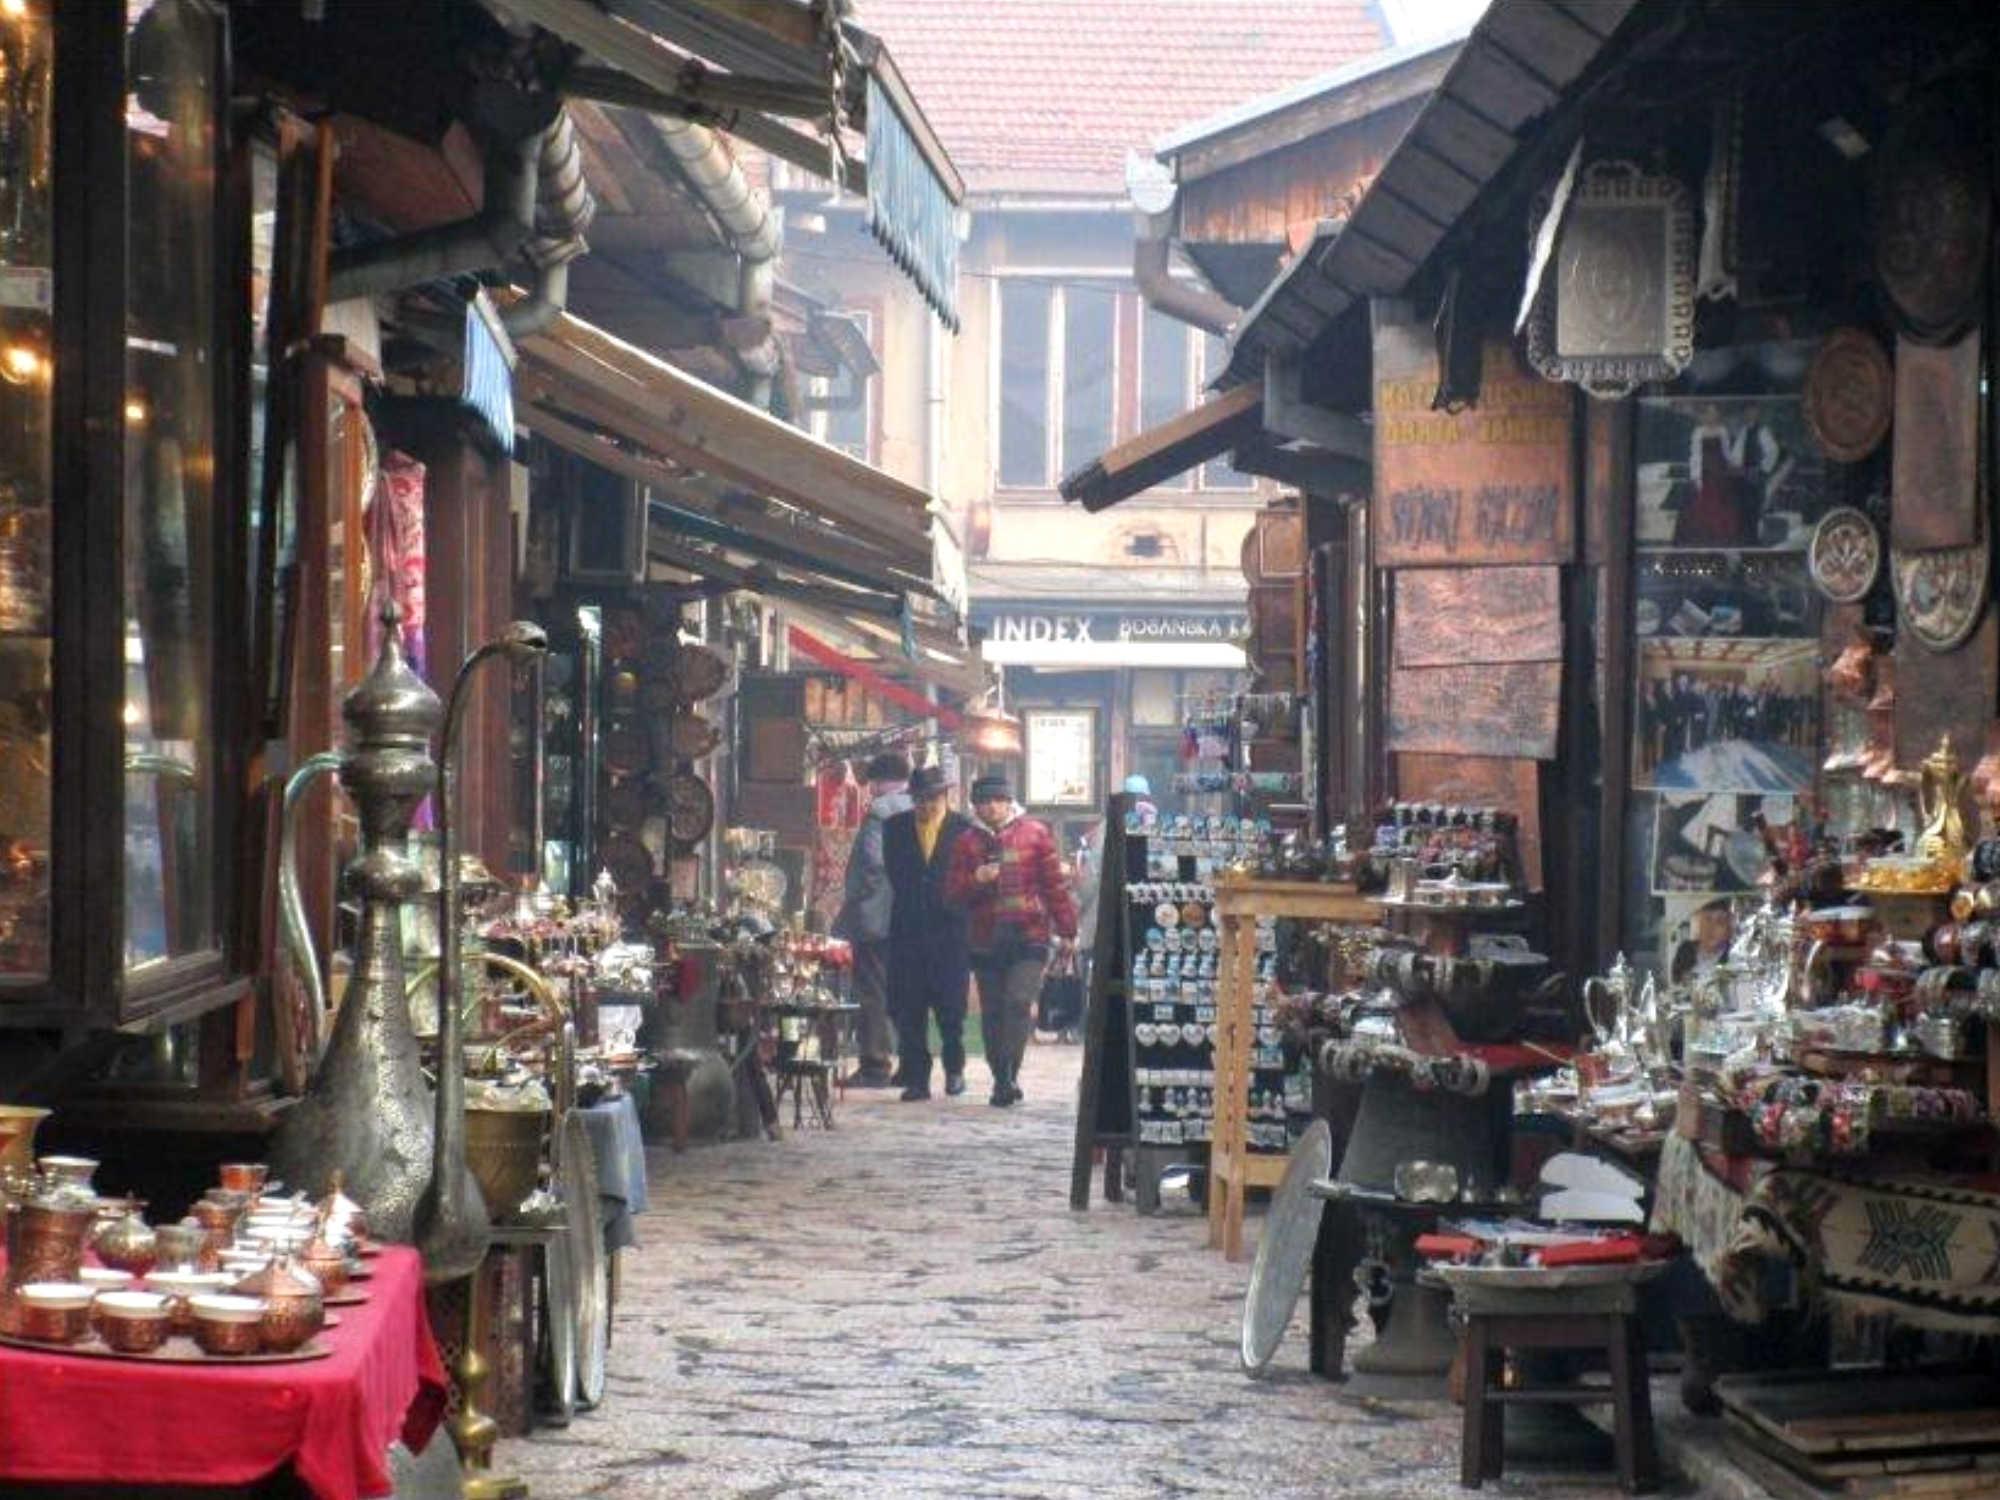 Where should I shop in Sarajevo?